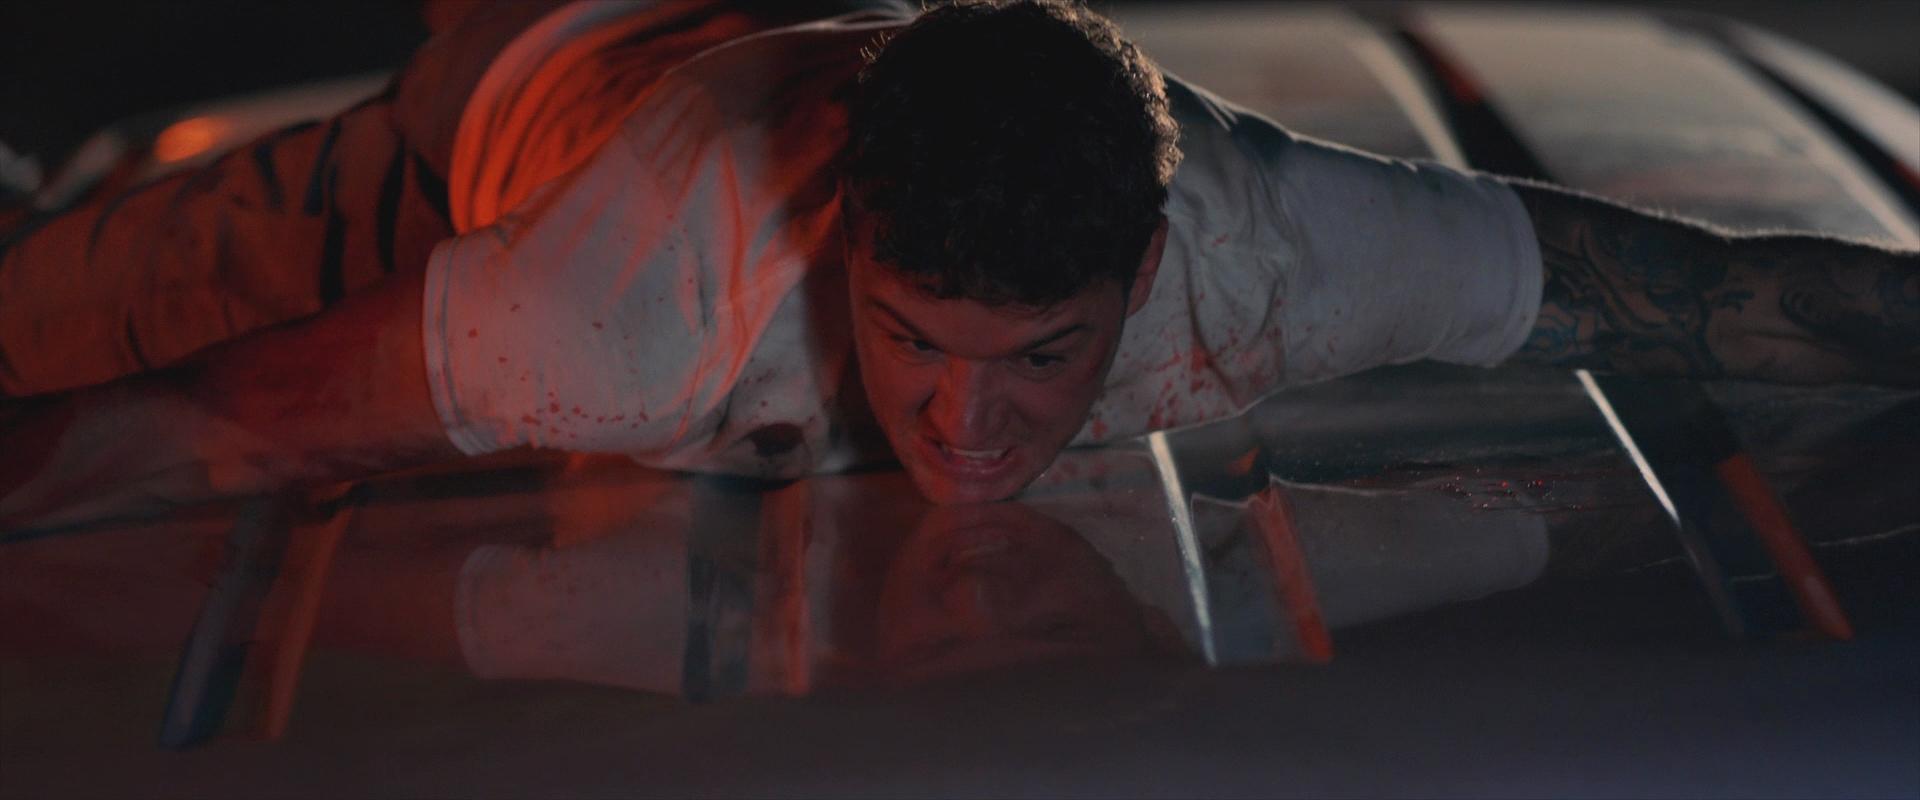 La Segunda (2020) 1080p BDrip Latino